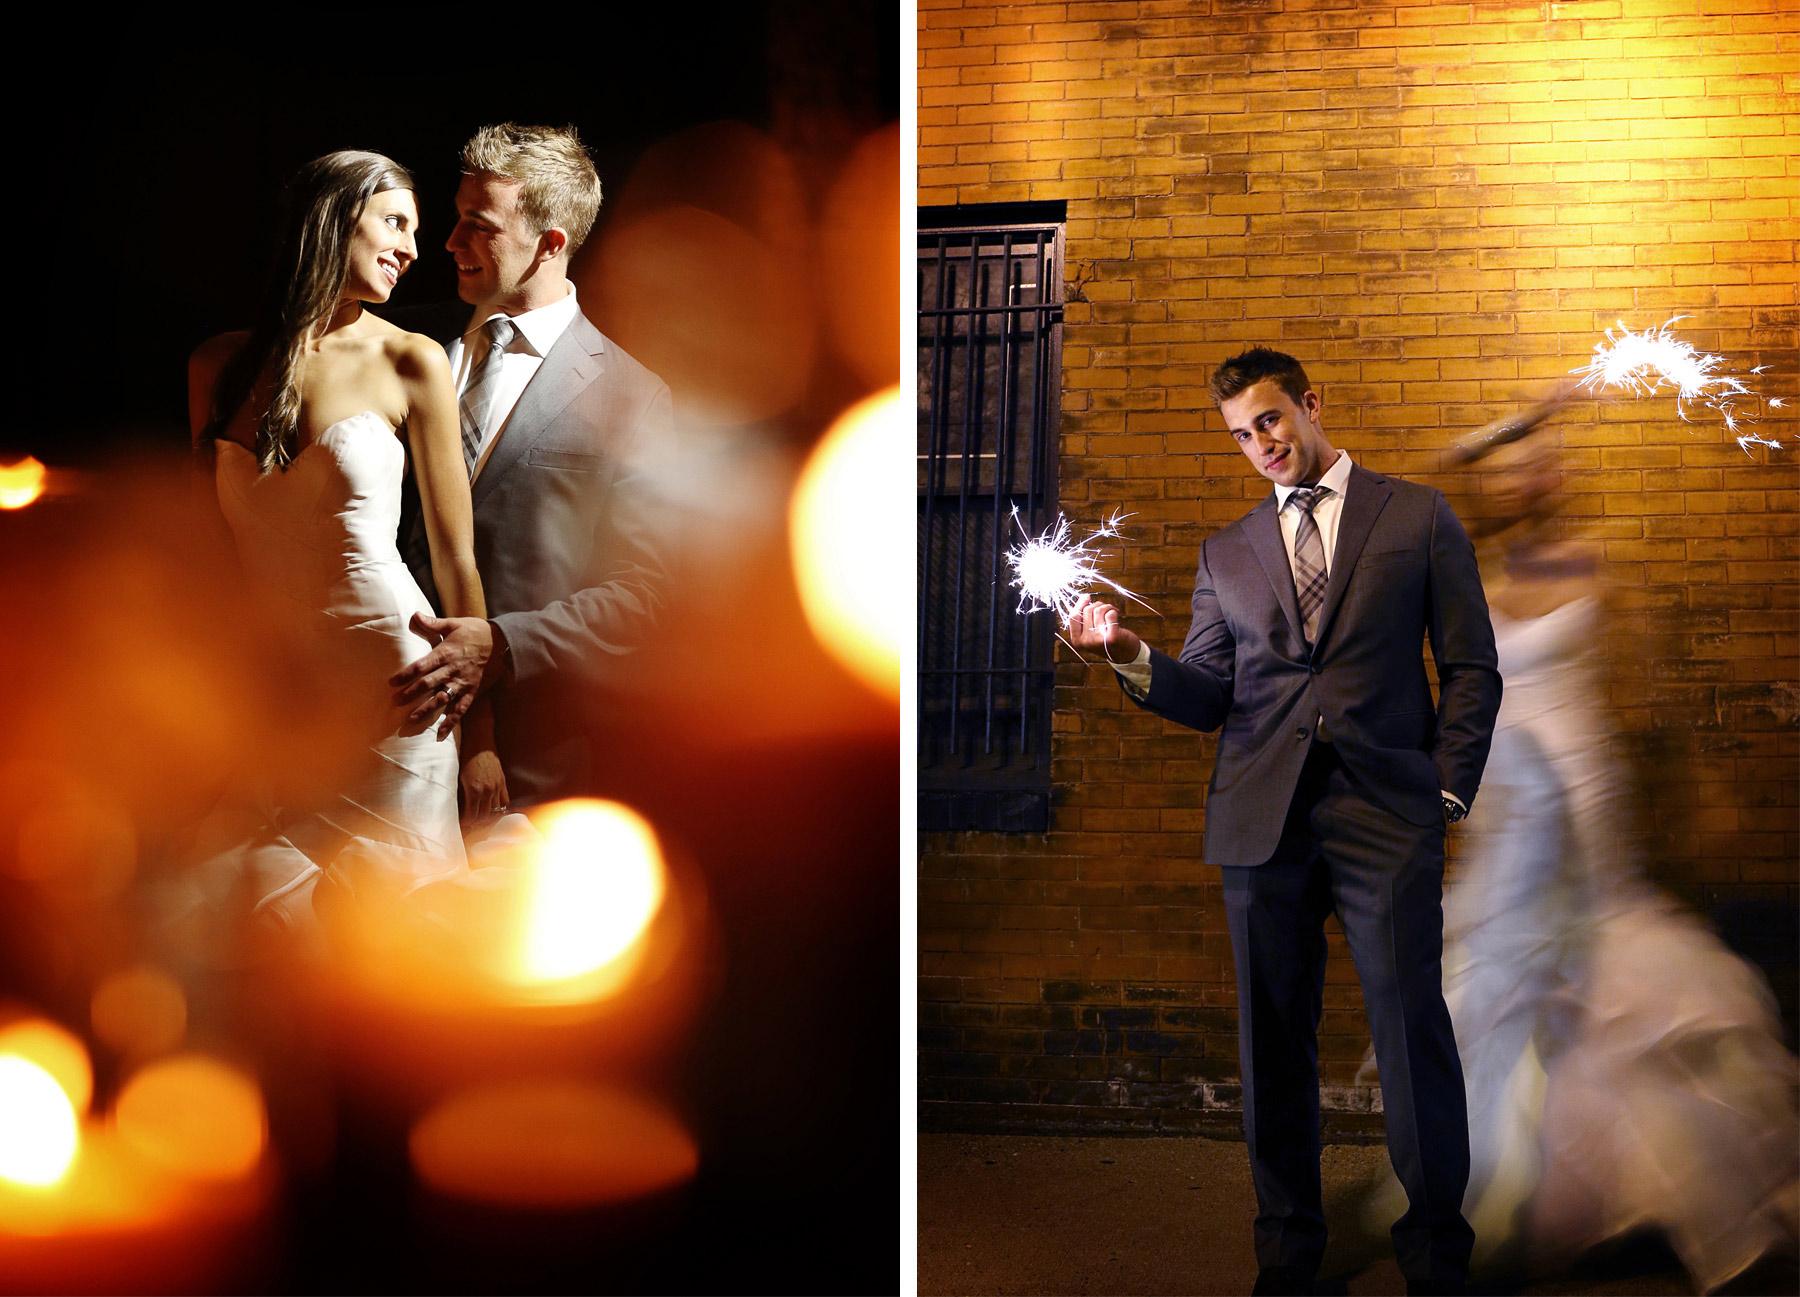 19-Minneapolis-Minnesota-Wedding-Photography-by-Vick-Photography-Aria-Reception-Katie-&-Joe.jpg